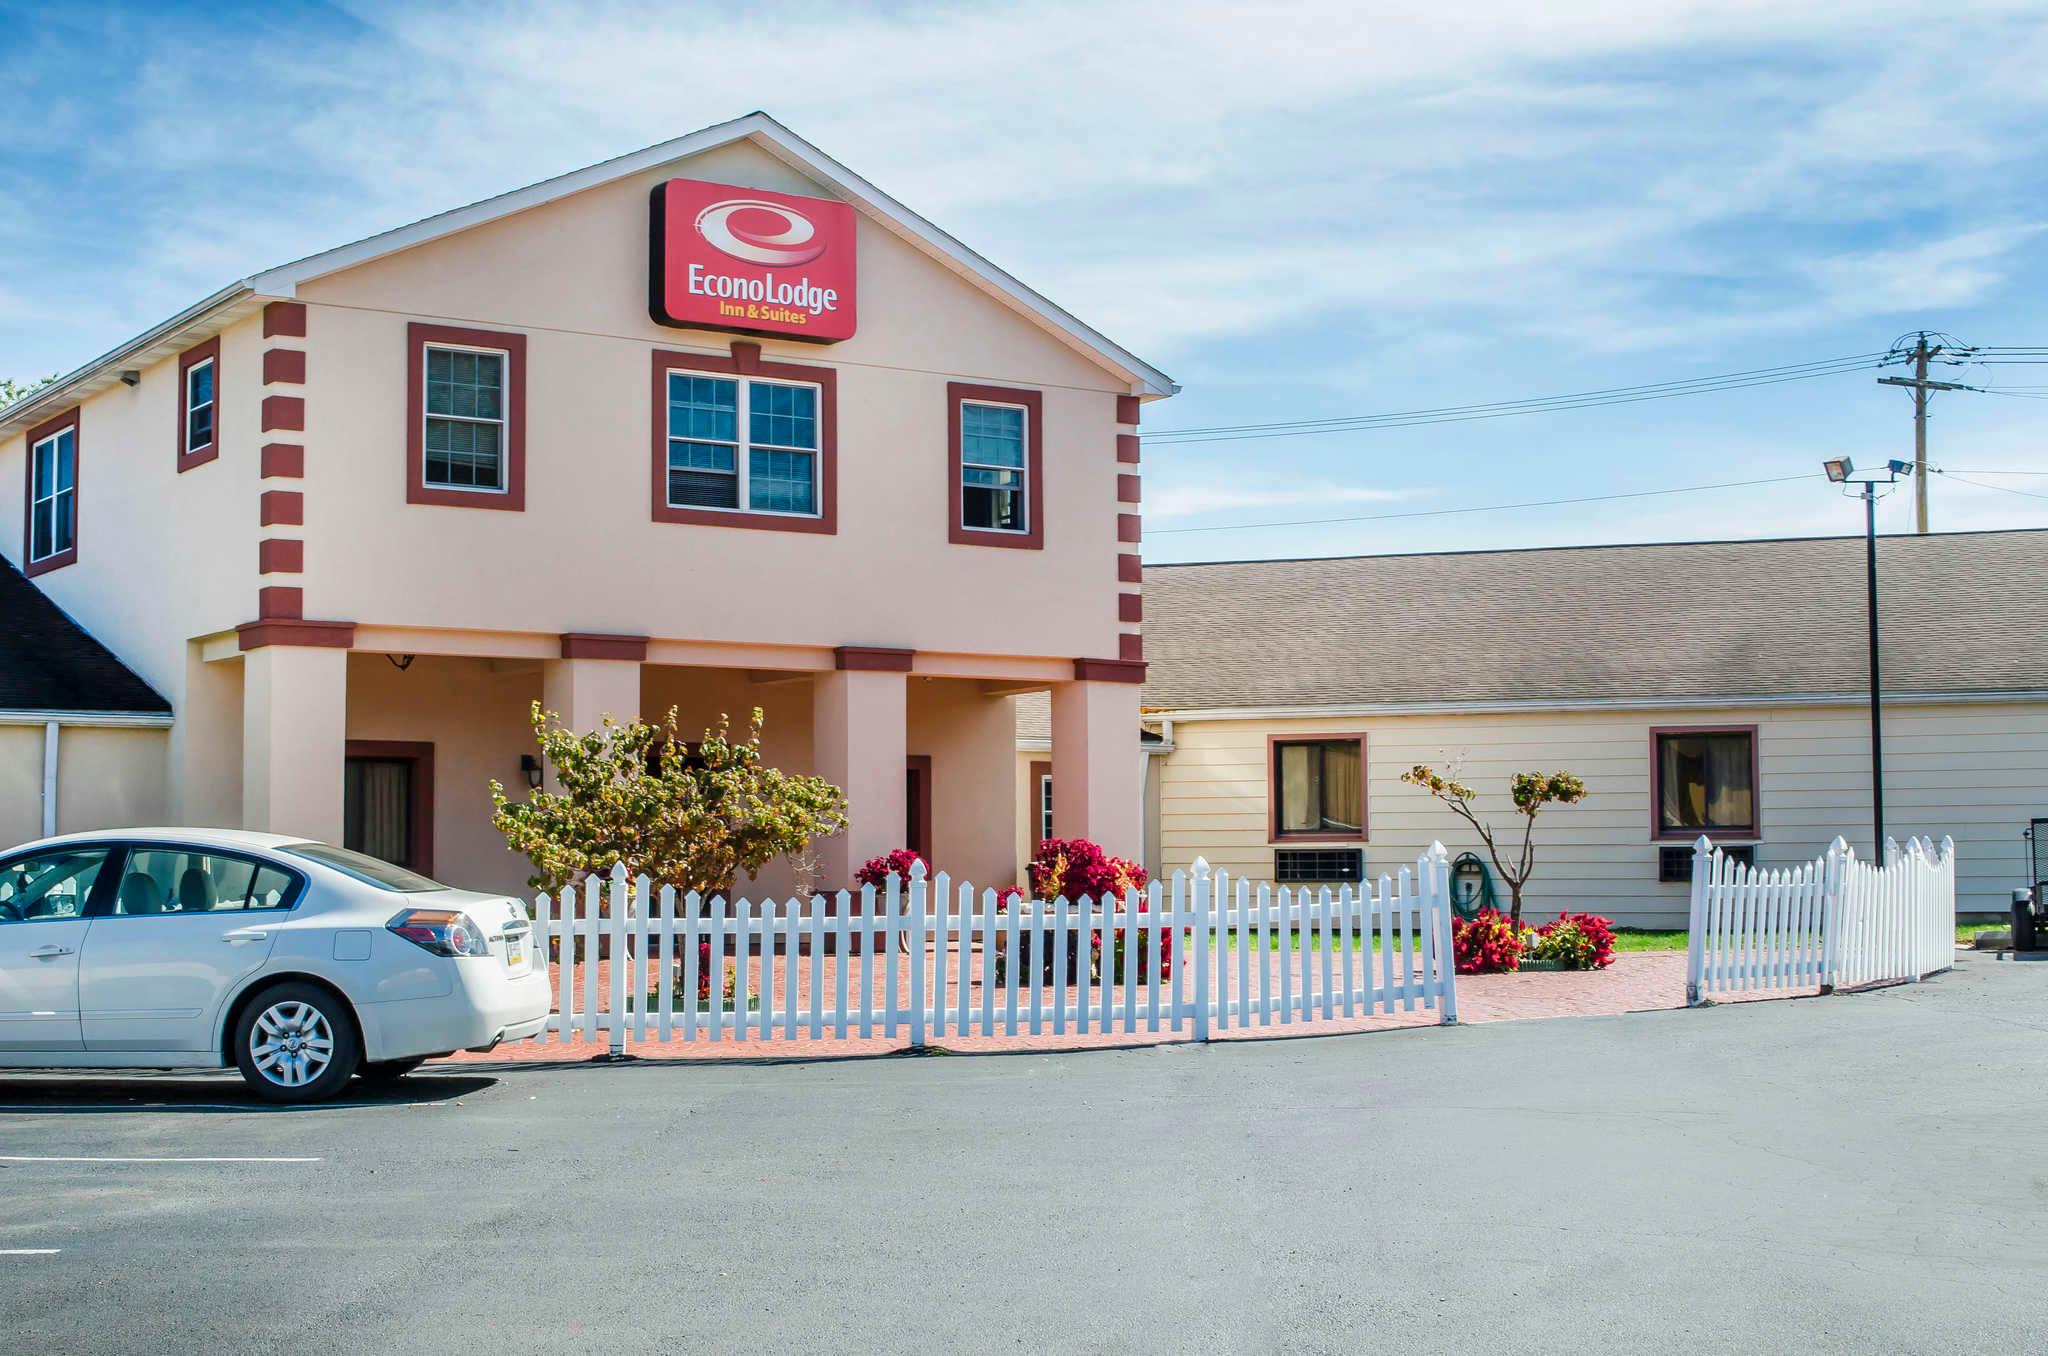 Econo Lodge Inn & Suites image 1